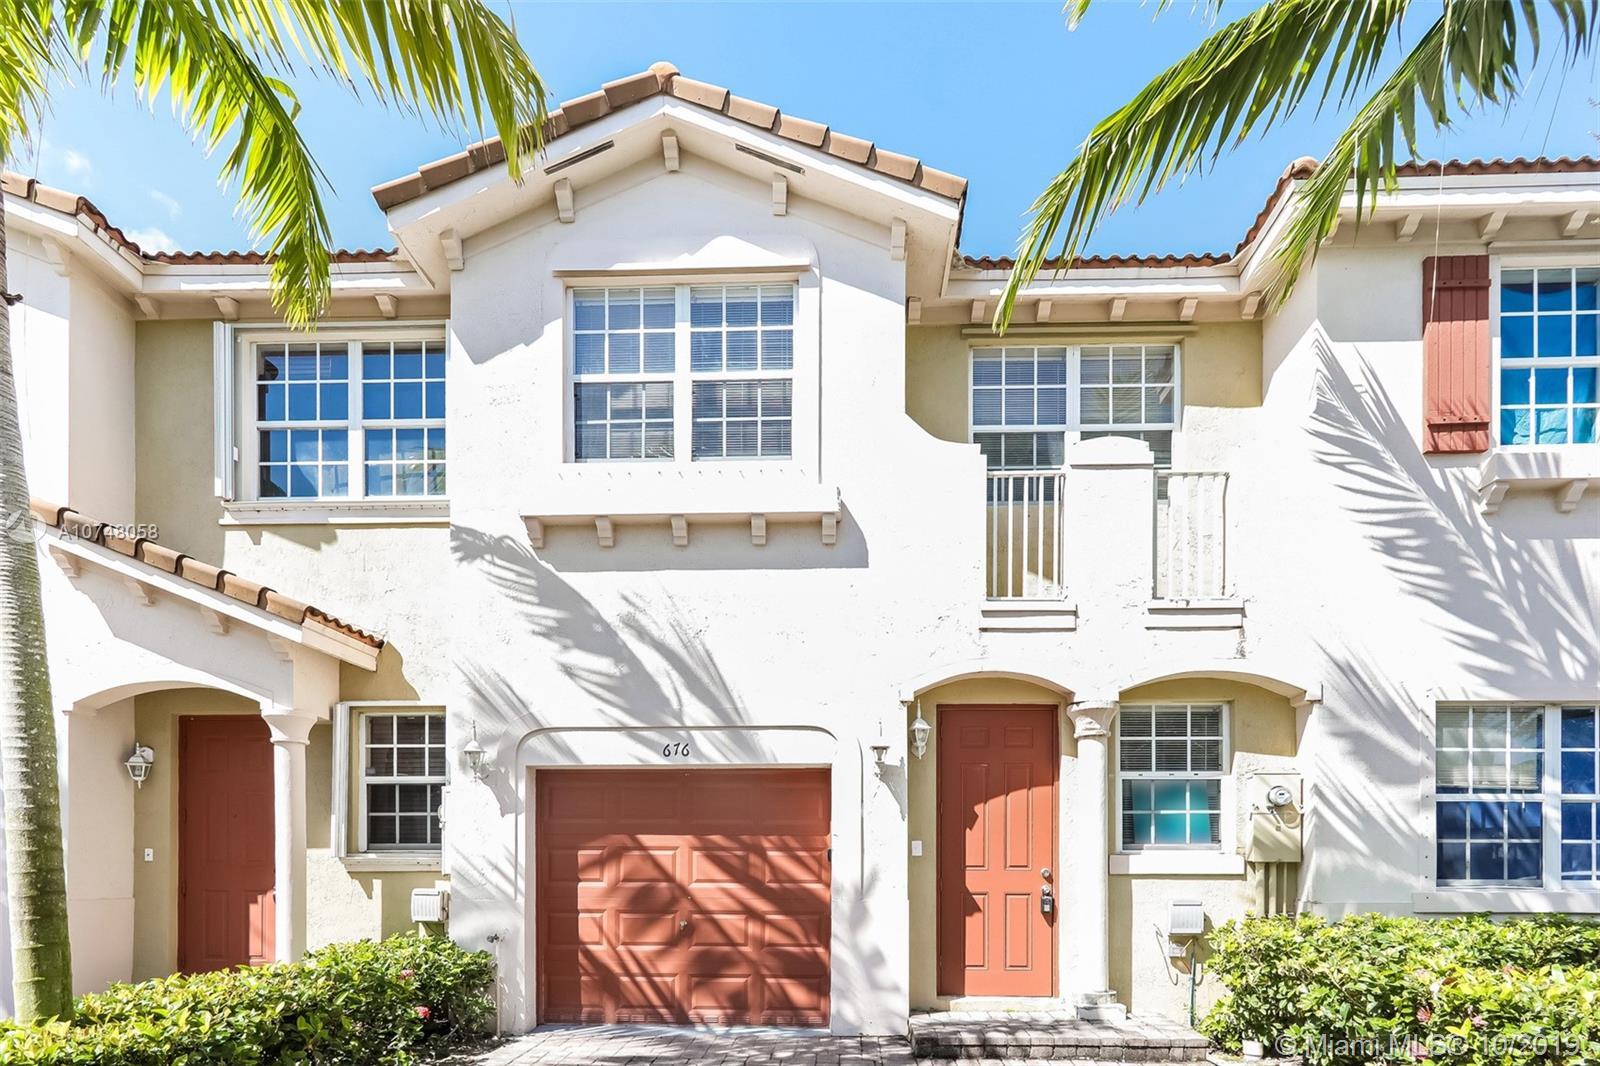 676 NE 21st Ter, Homestead, FL 33033 - Homestead, FL real estate listing